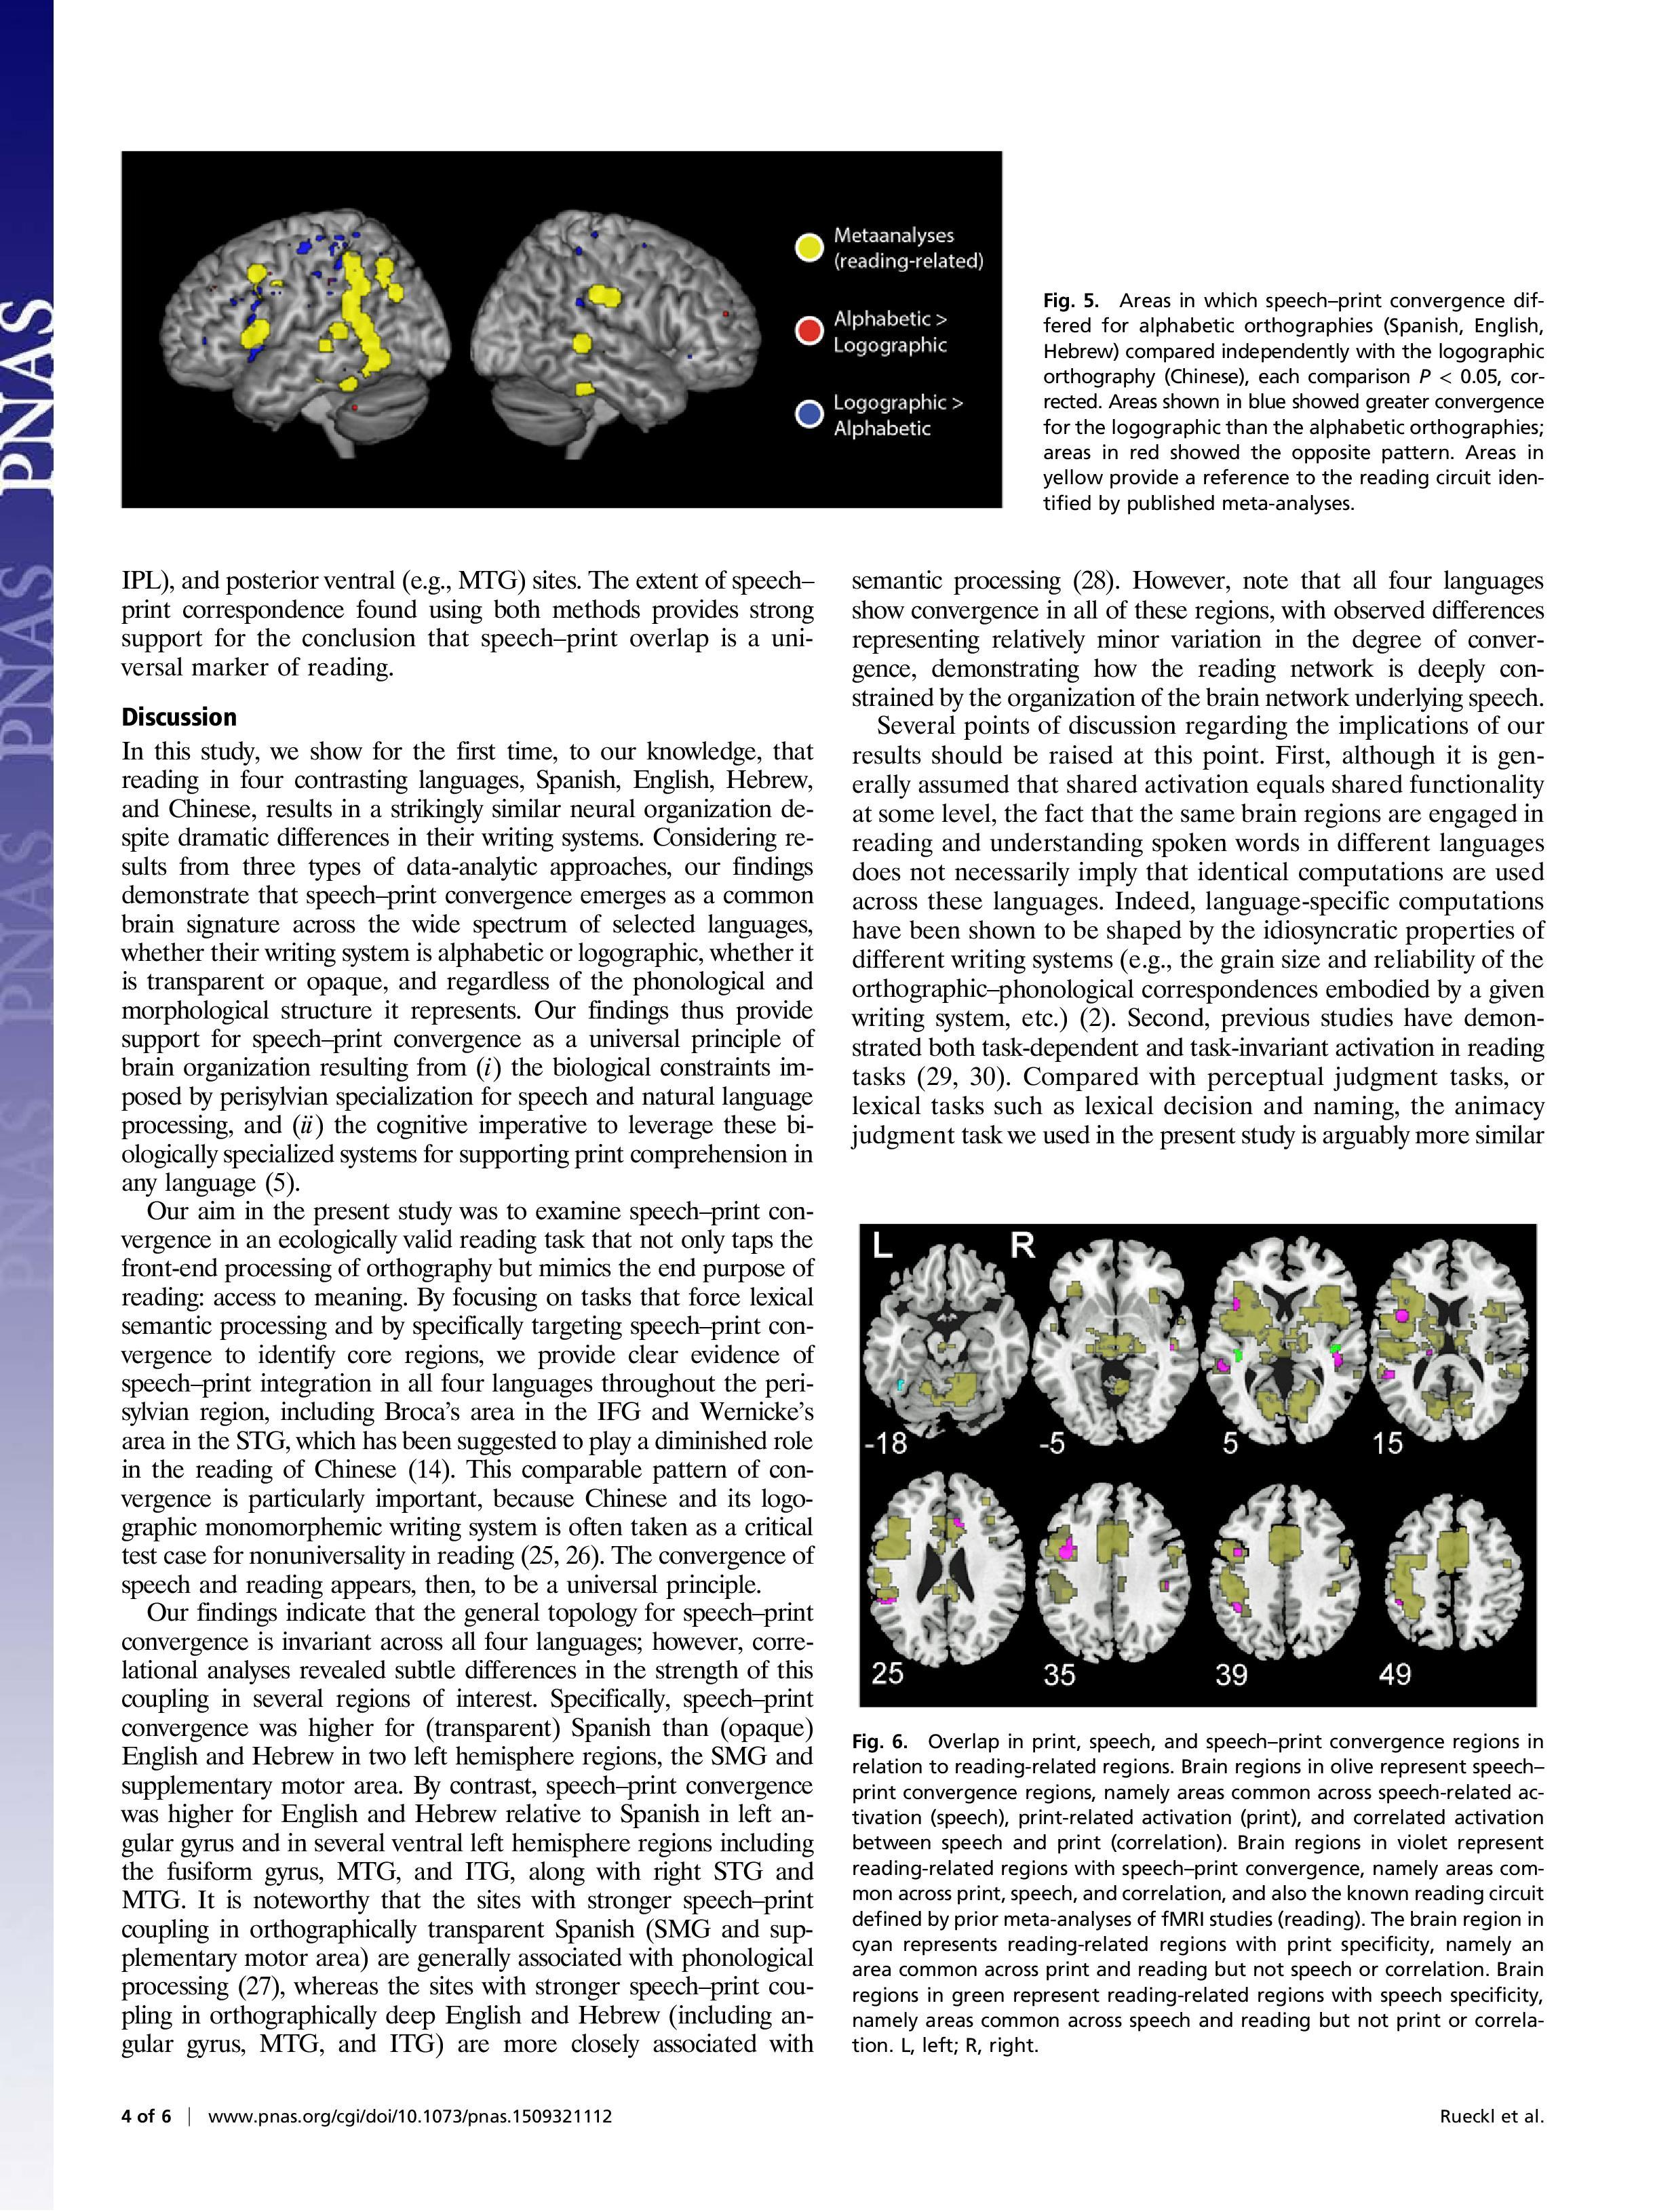 PNAS-2015-Rueckl-1509321112 (1)-page-004.jpg